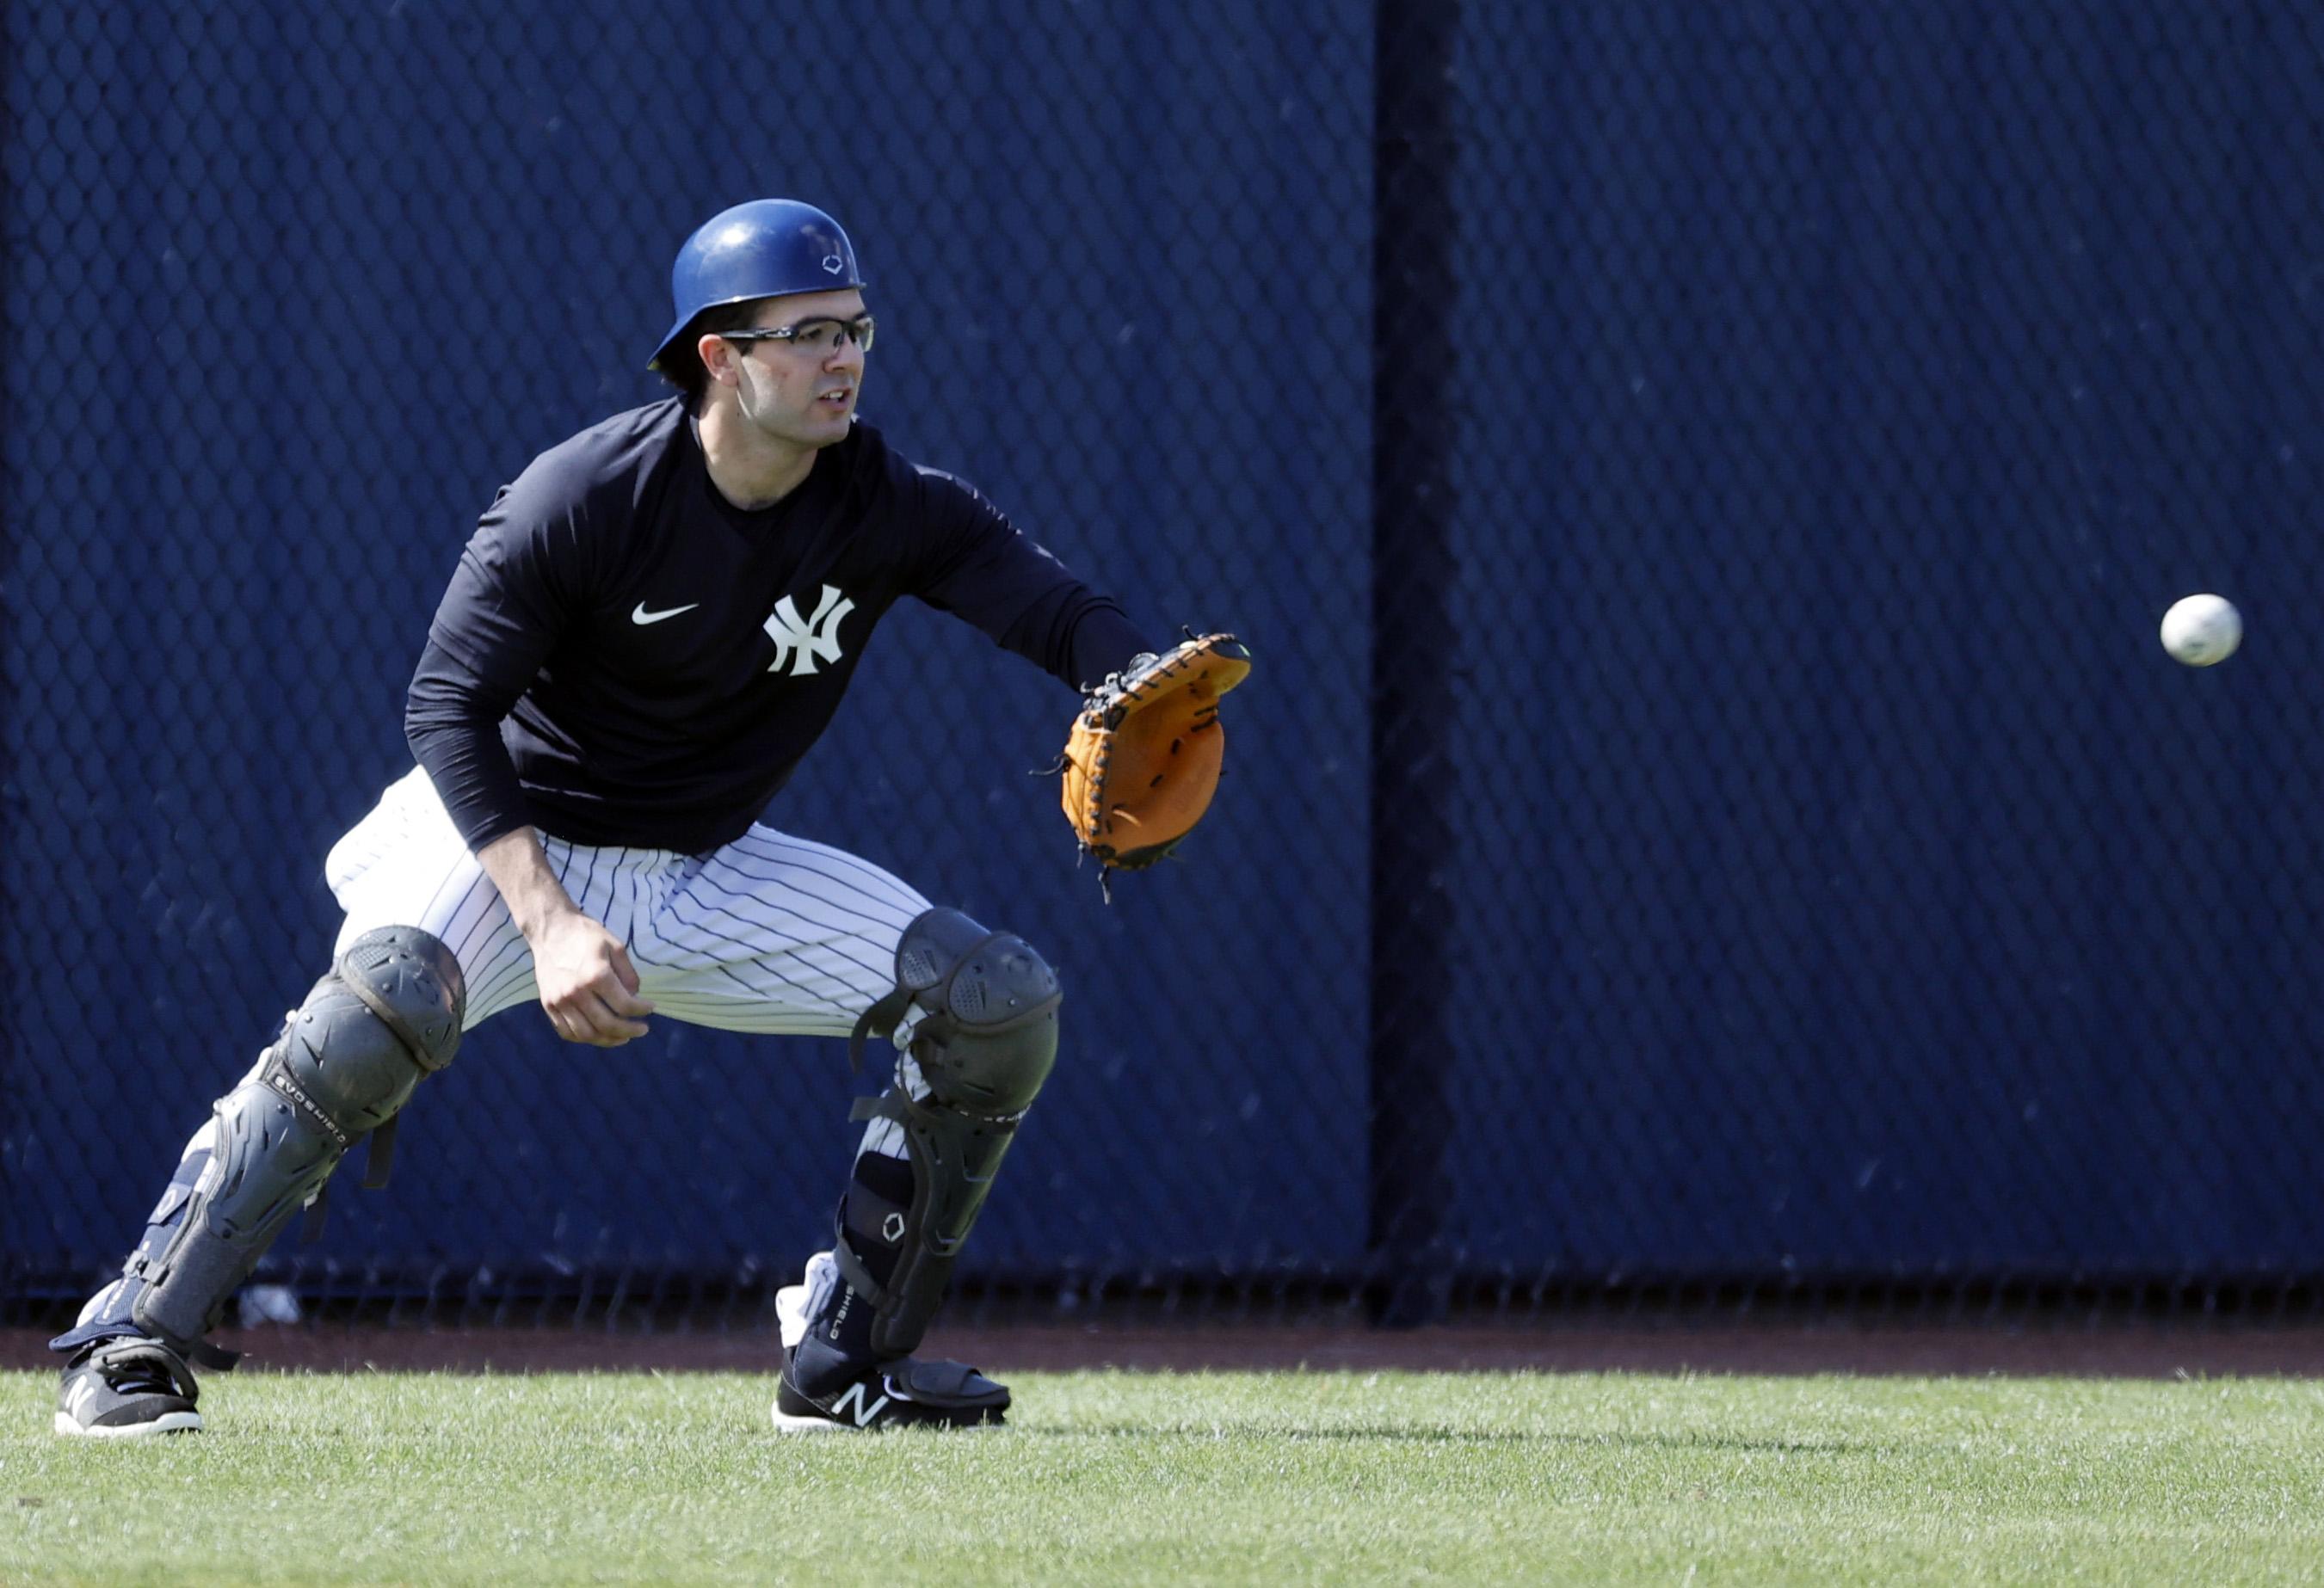 Austin Wells, New York Yankees